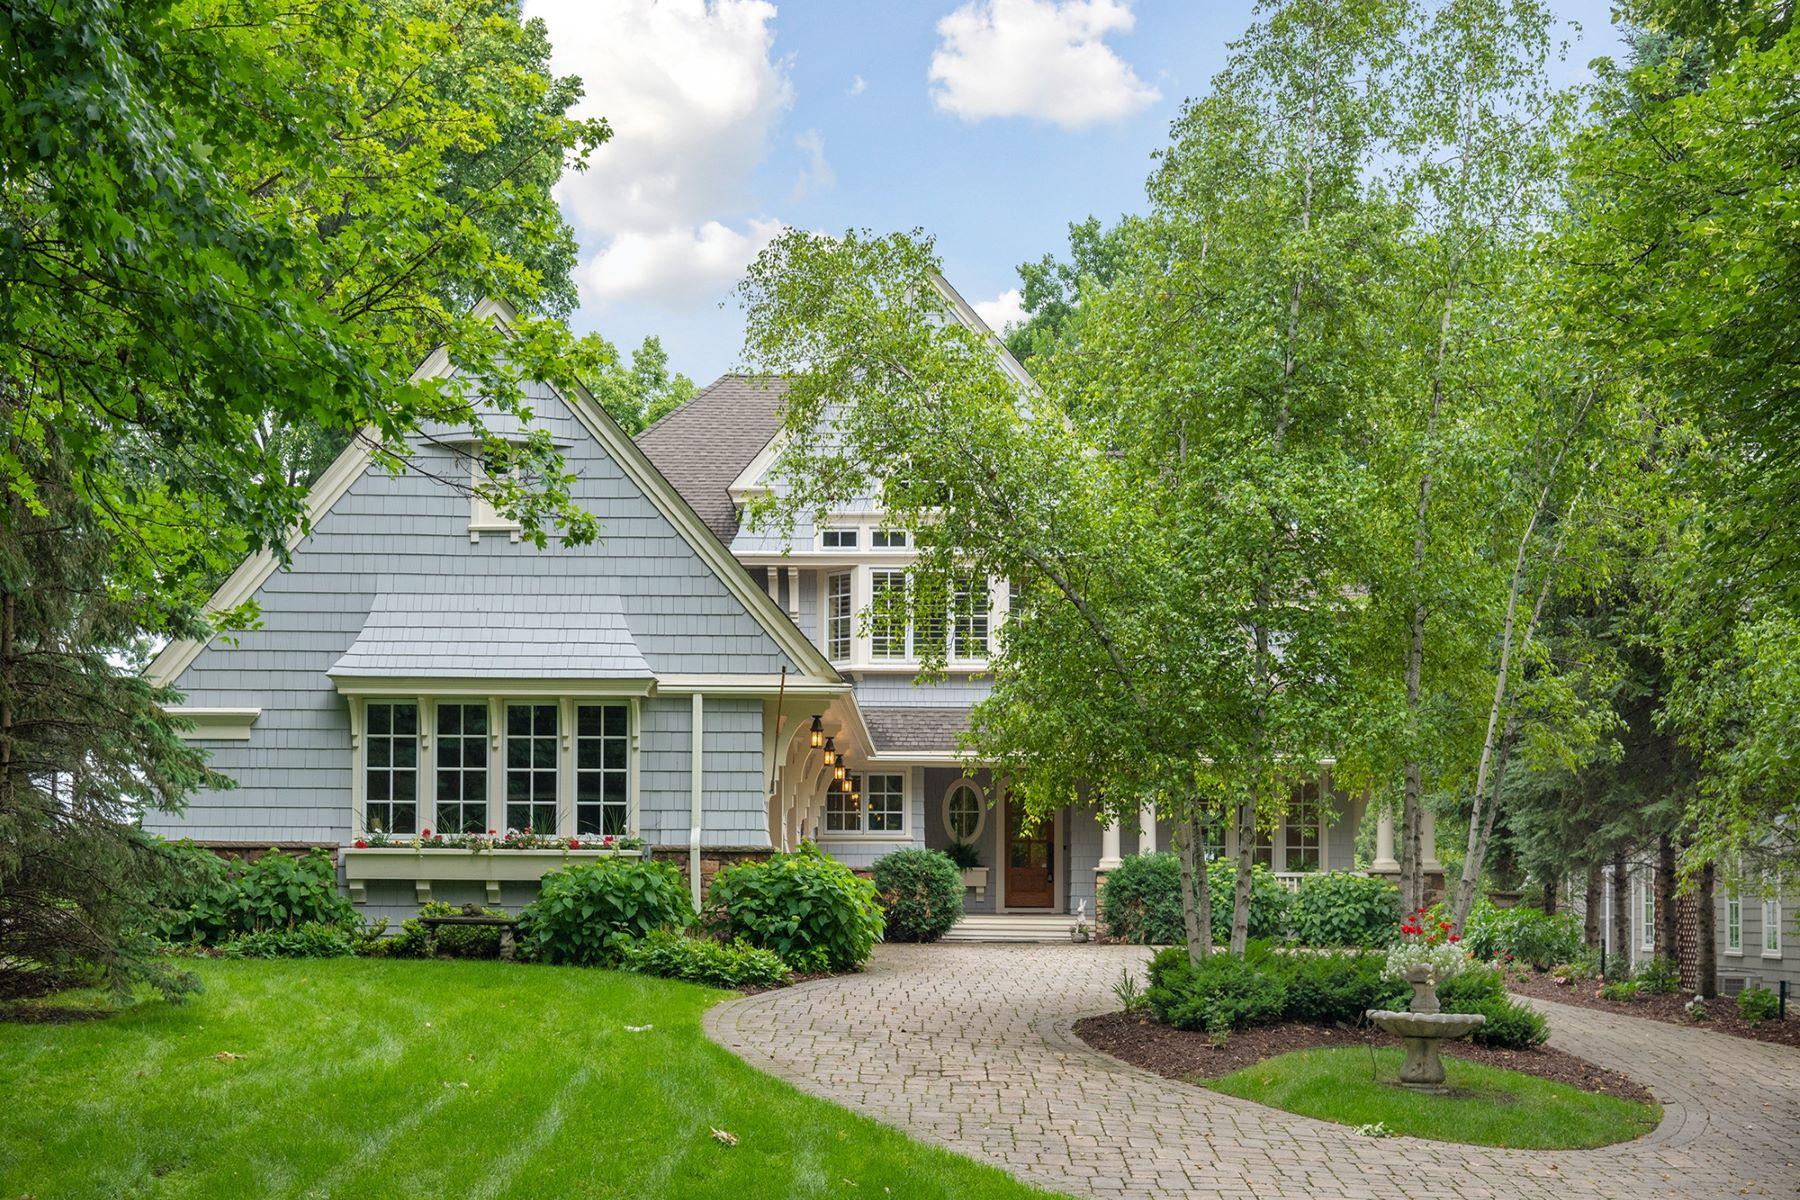 Single Family Homes für Verkauf beim Custom Built Charles Cudd Home on 75 Feet of Prime Lake Minnetonka Lakeshore 70 Wildhurst Road, Tonka Bay, Minnesota 55331 Vereinigte Staaten